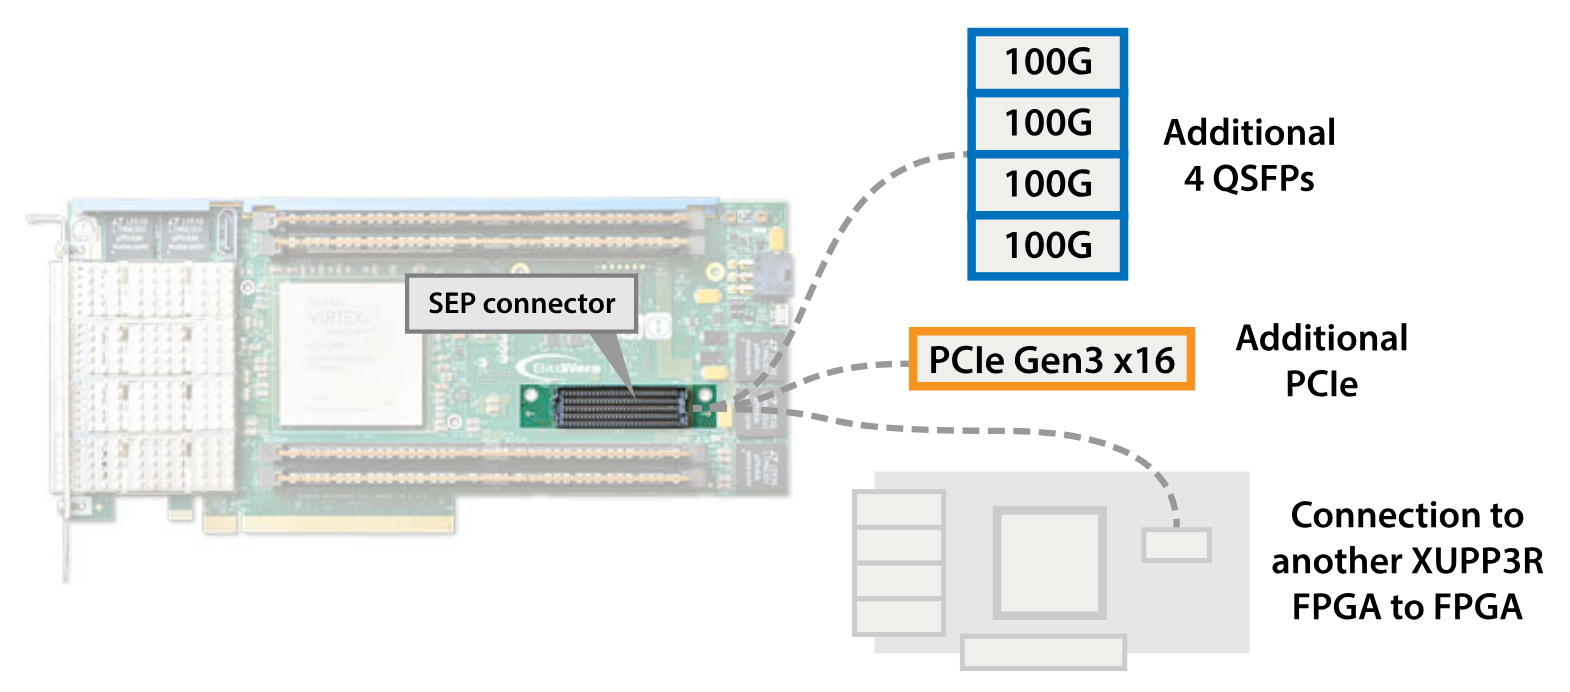 BittWare XUPP3R – Xilinx UltraScale+ VU13P FPGA with 4x QSFP, 512 GB